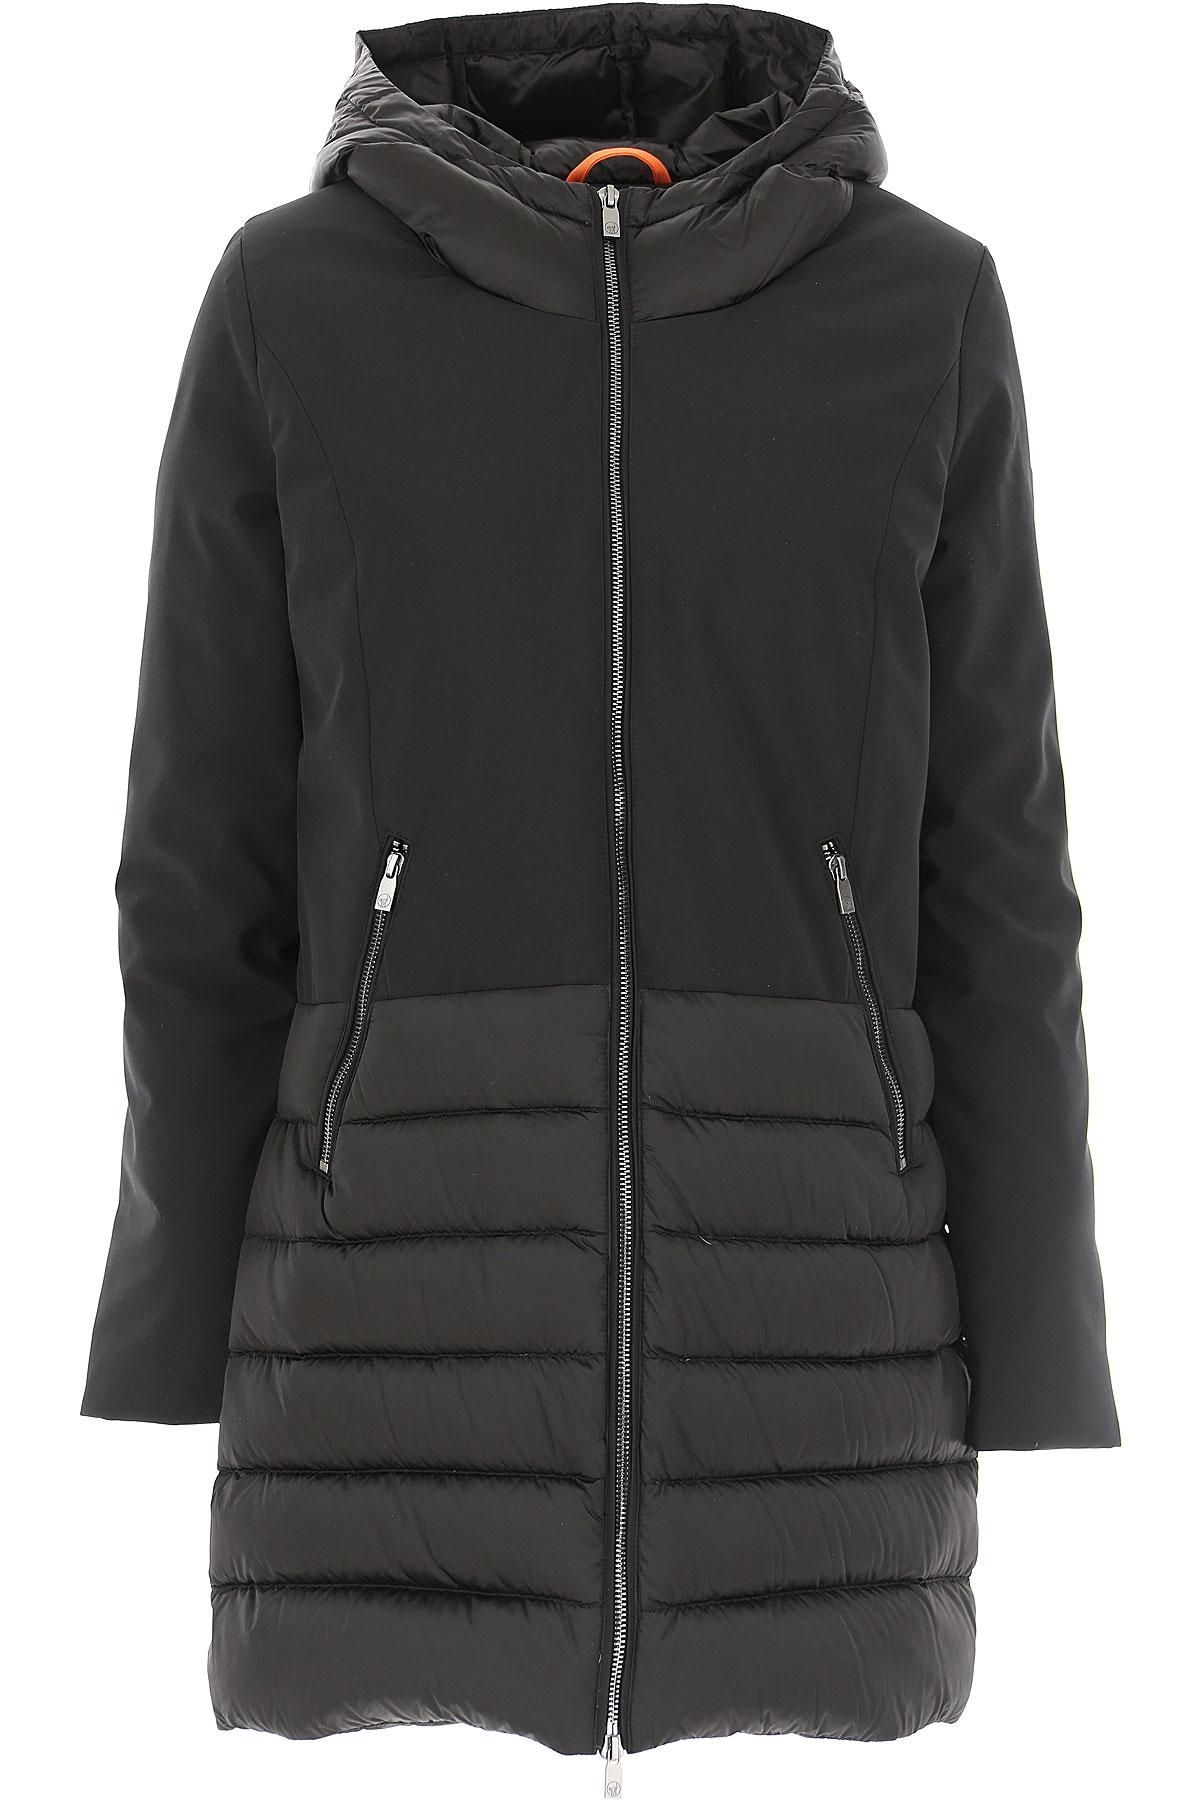 Ciesse Piumini Down Jacket for Women, Puffer Ski Jacket On Sale, Black, Down, 2019, 4 6